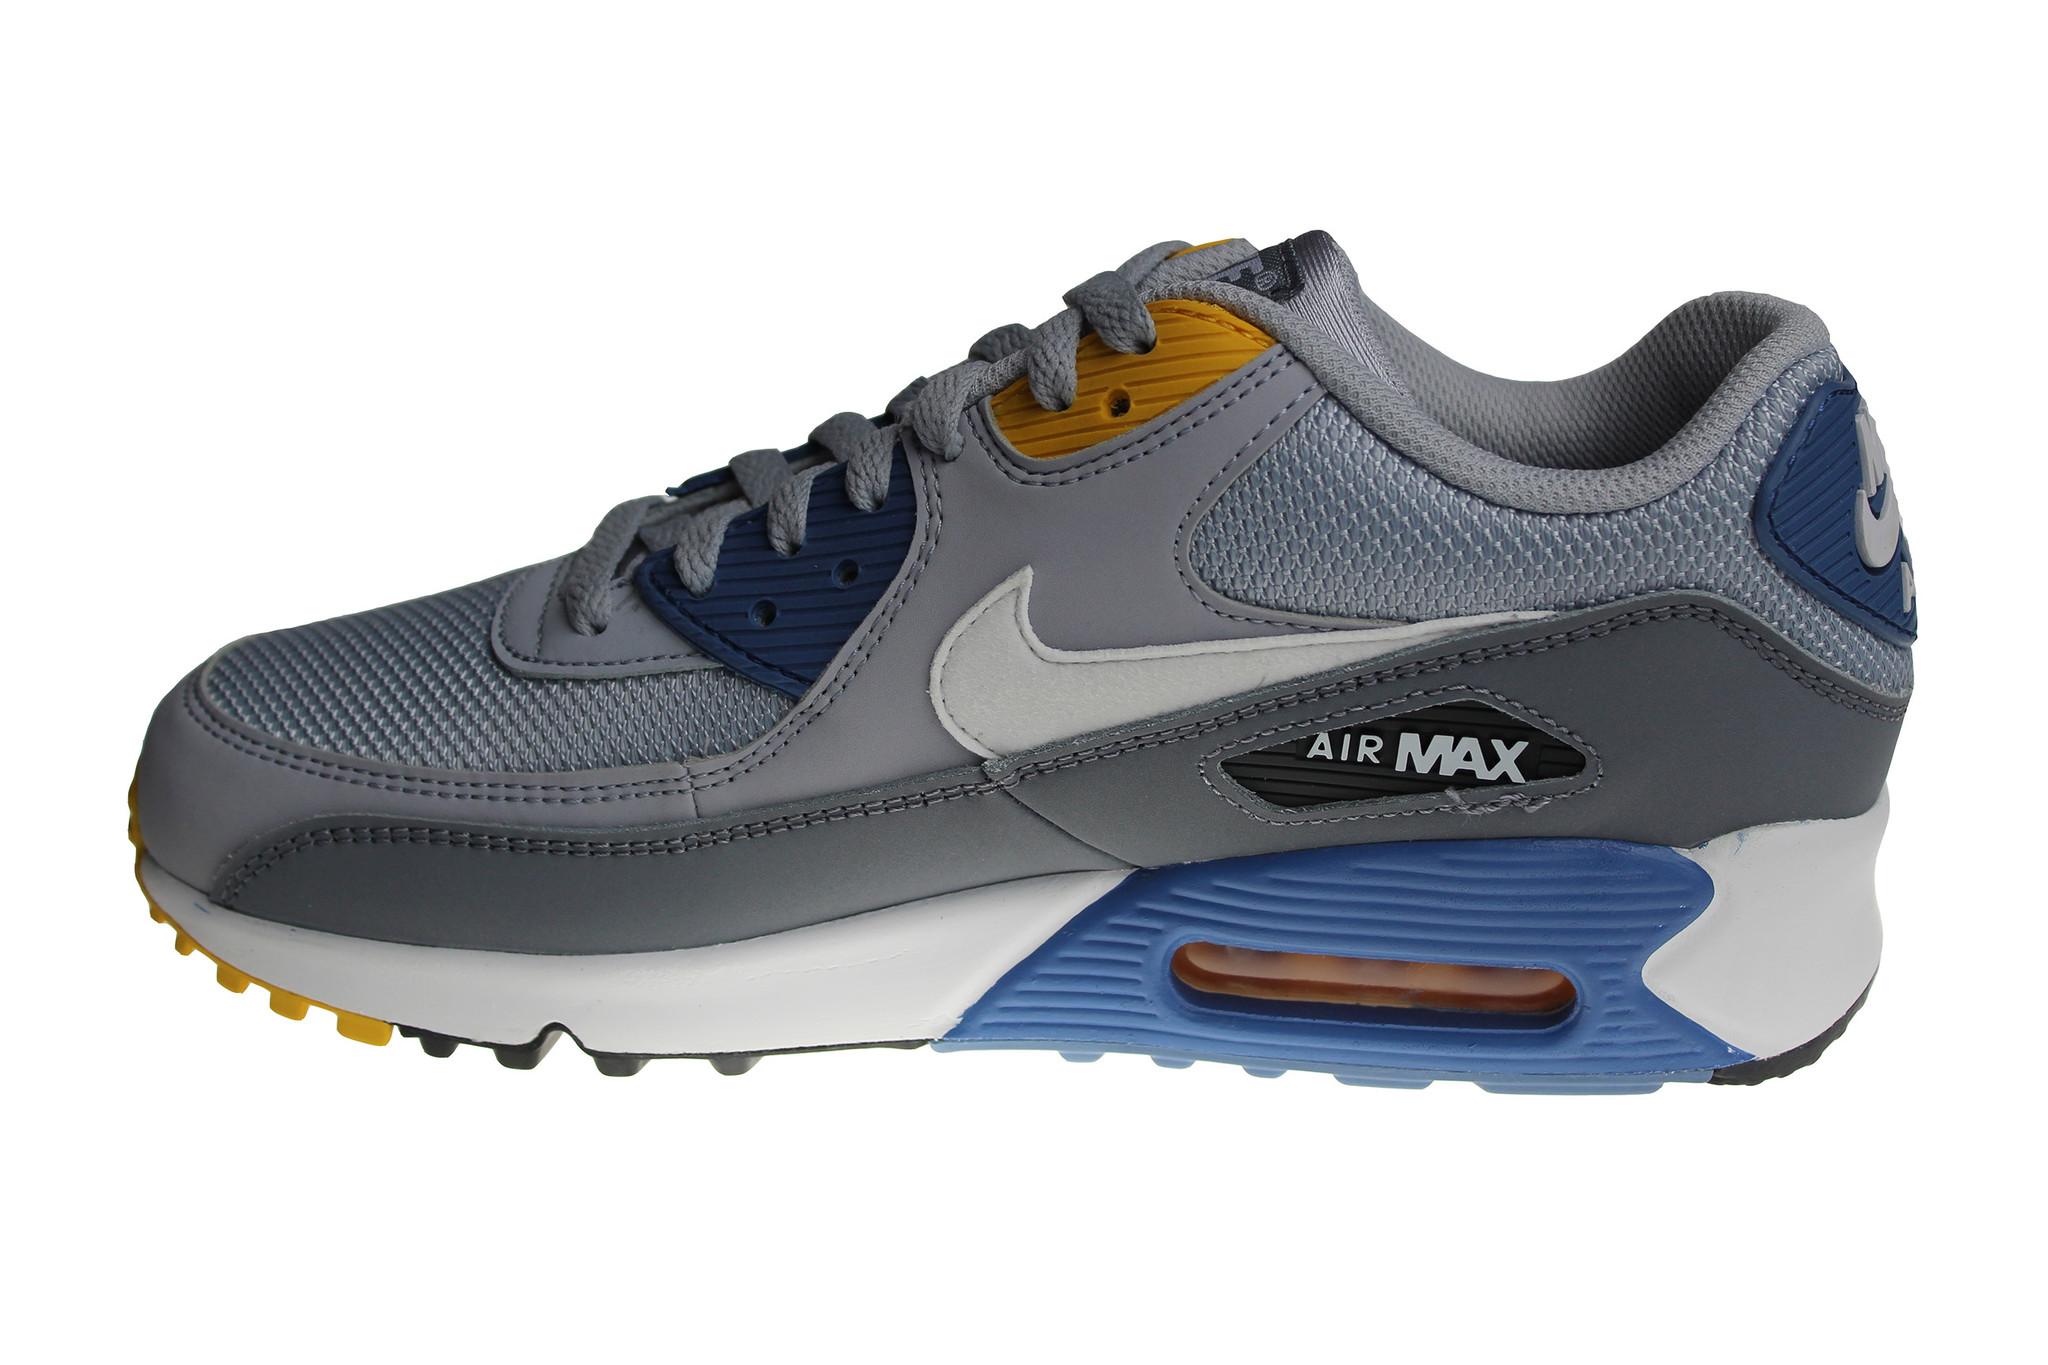 Nike Air Max 90 Essential (GreyBlueWhiteYellow) AJ1285 016 Men's Sneakers